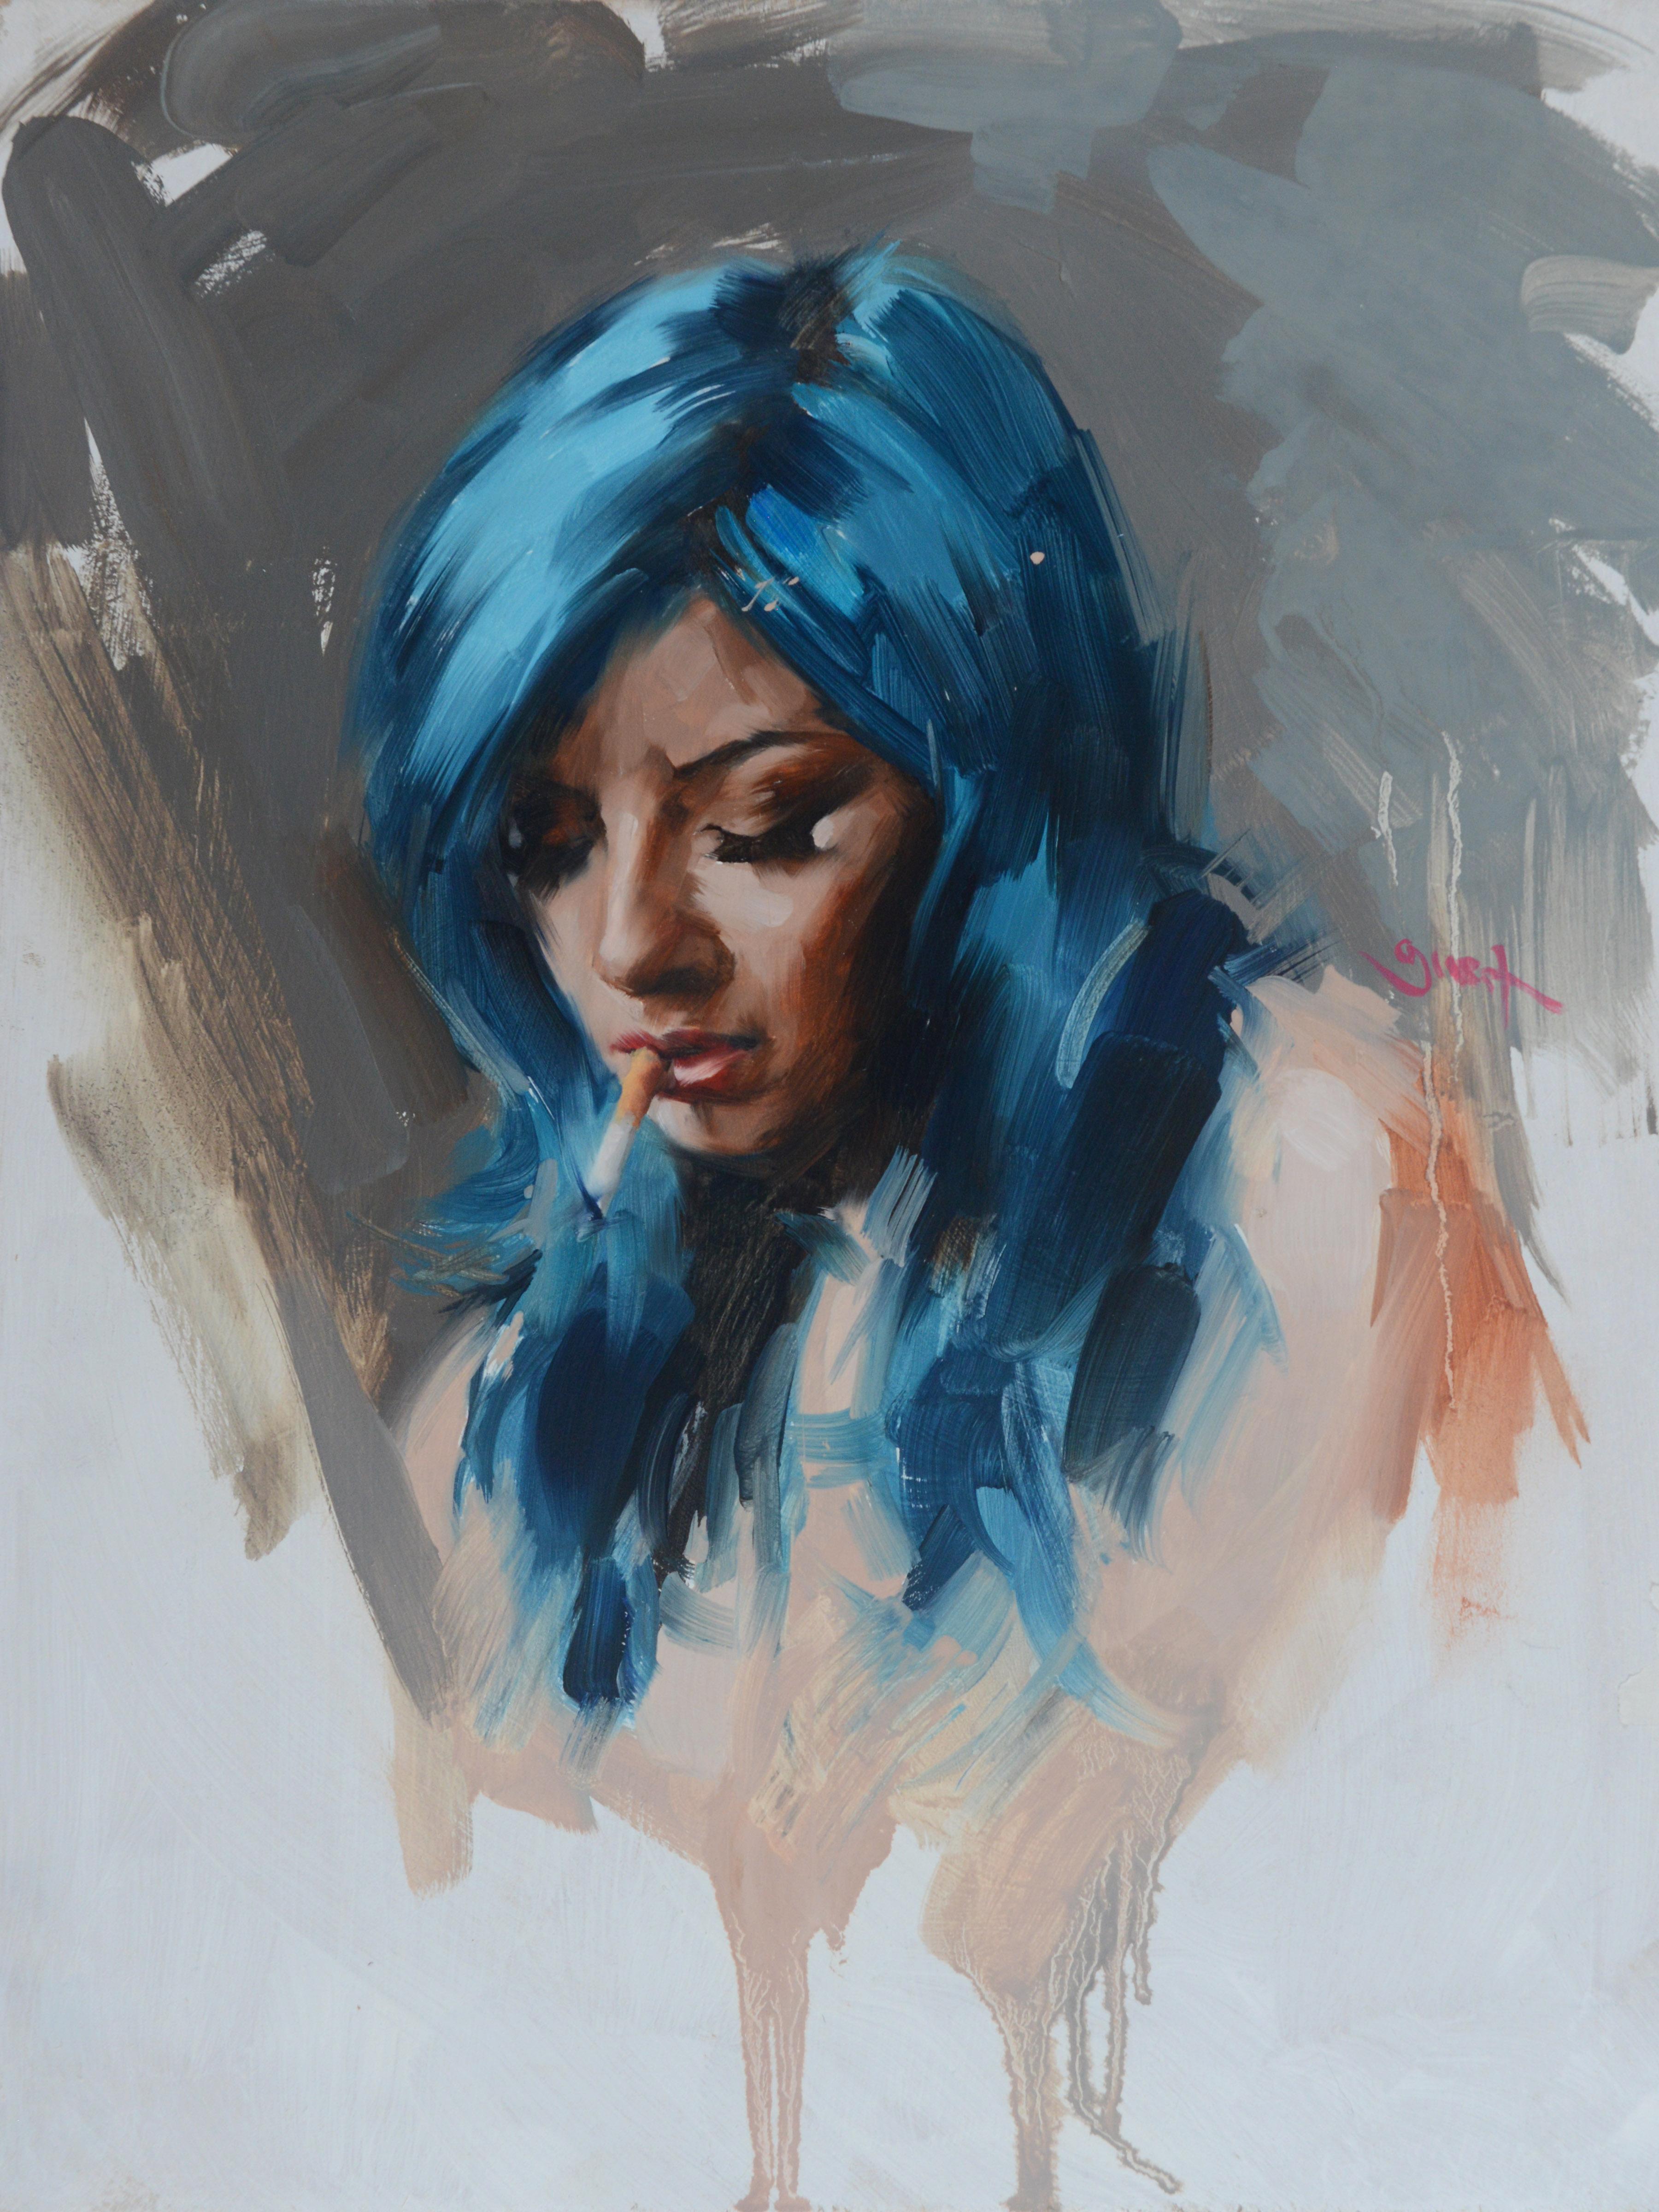 BLUE HAIR SMOKING